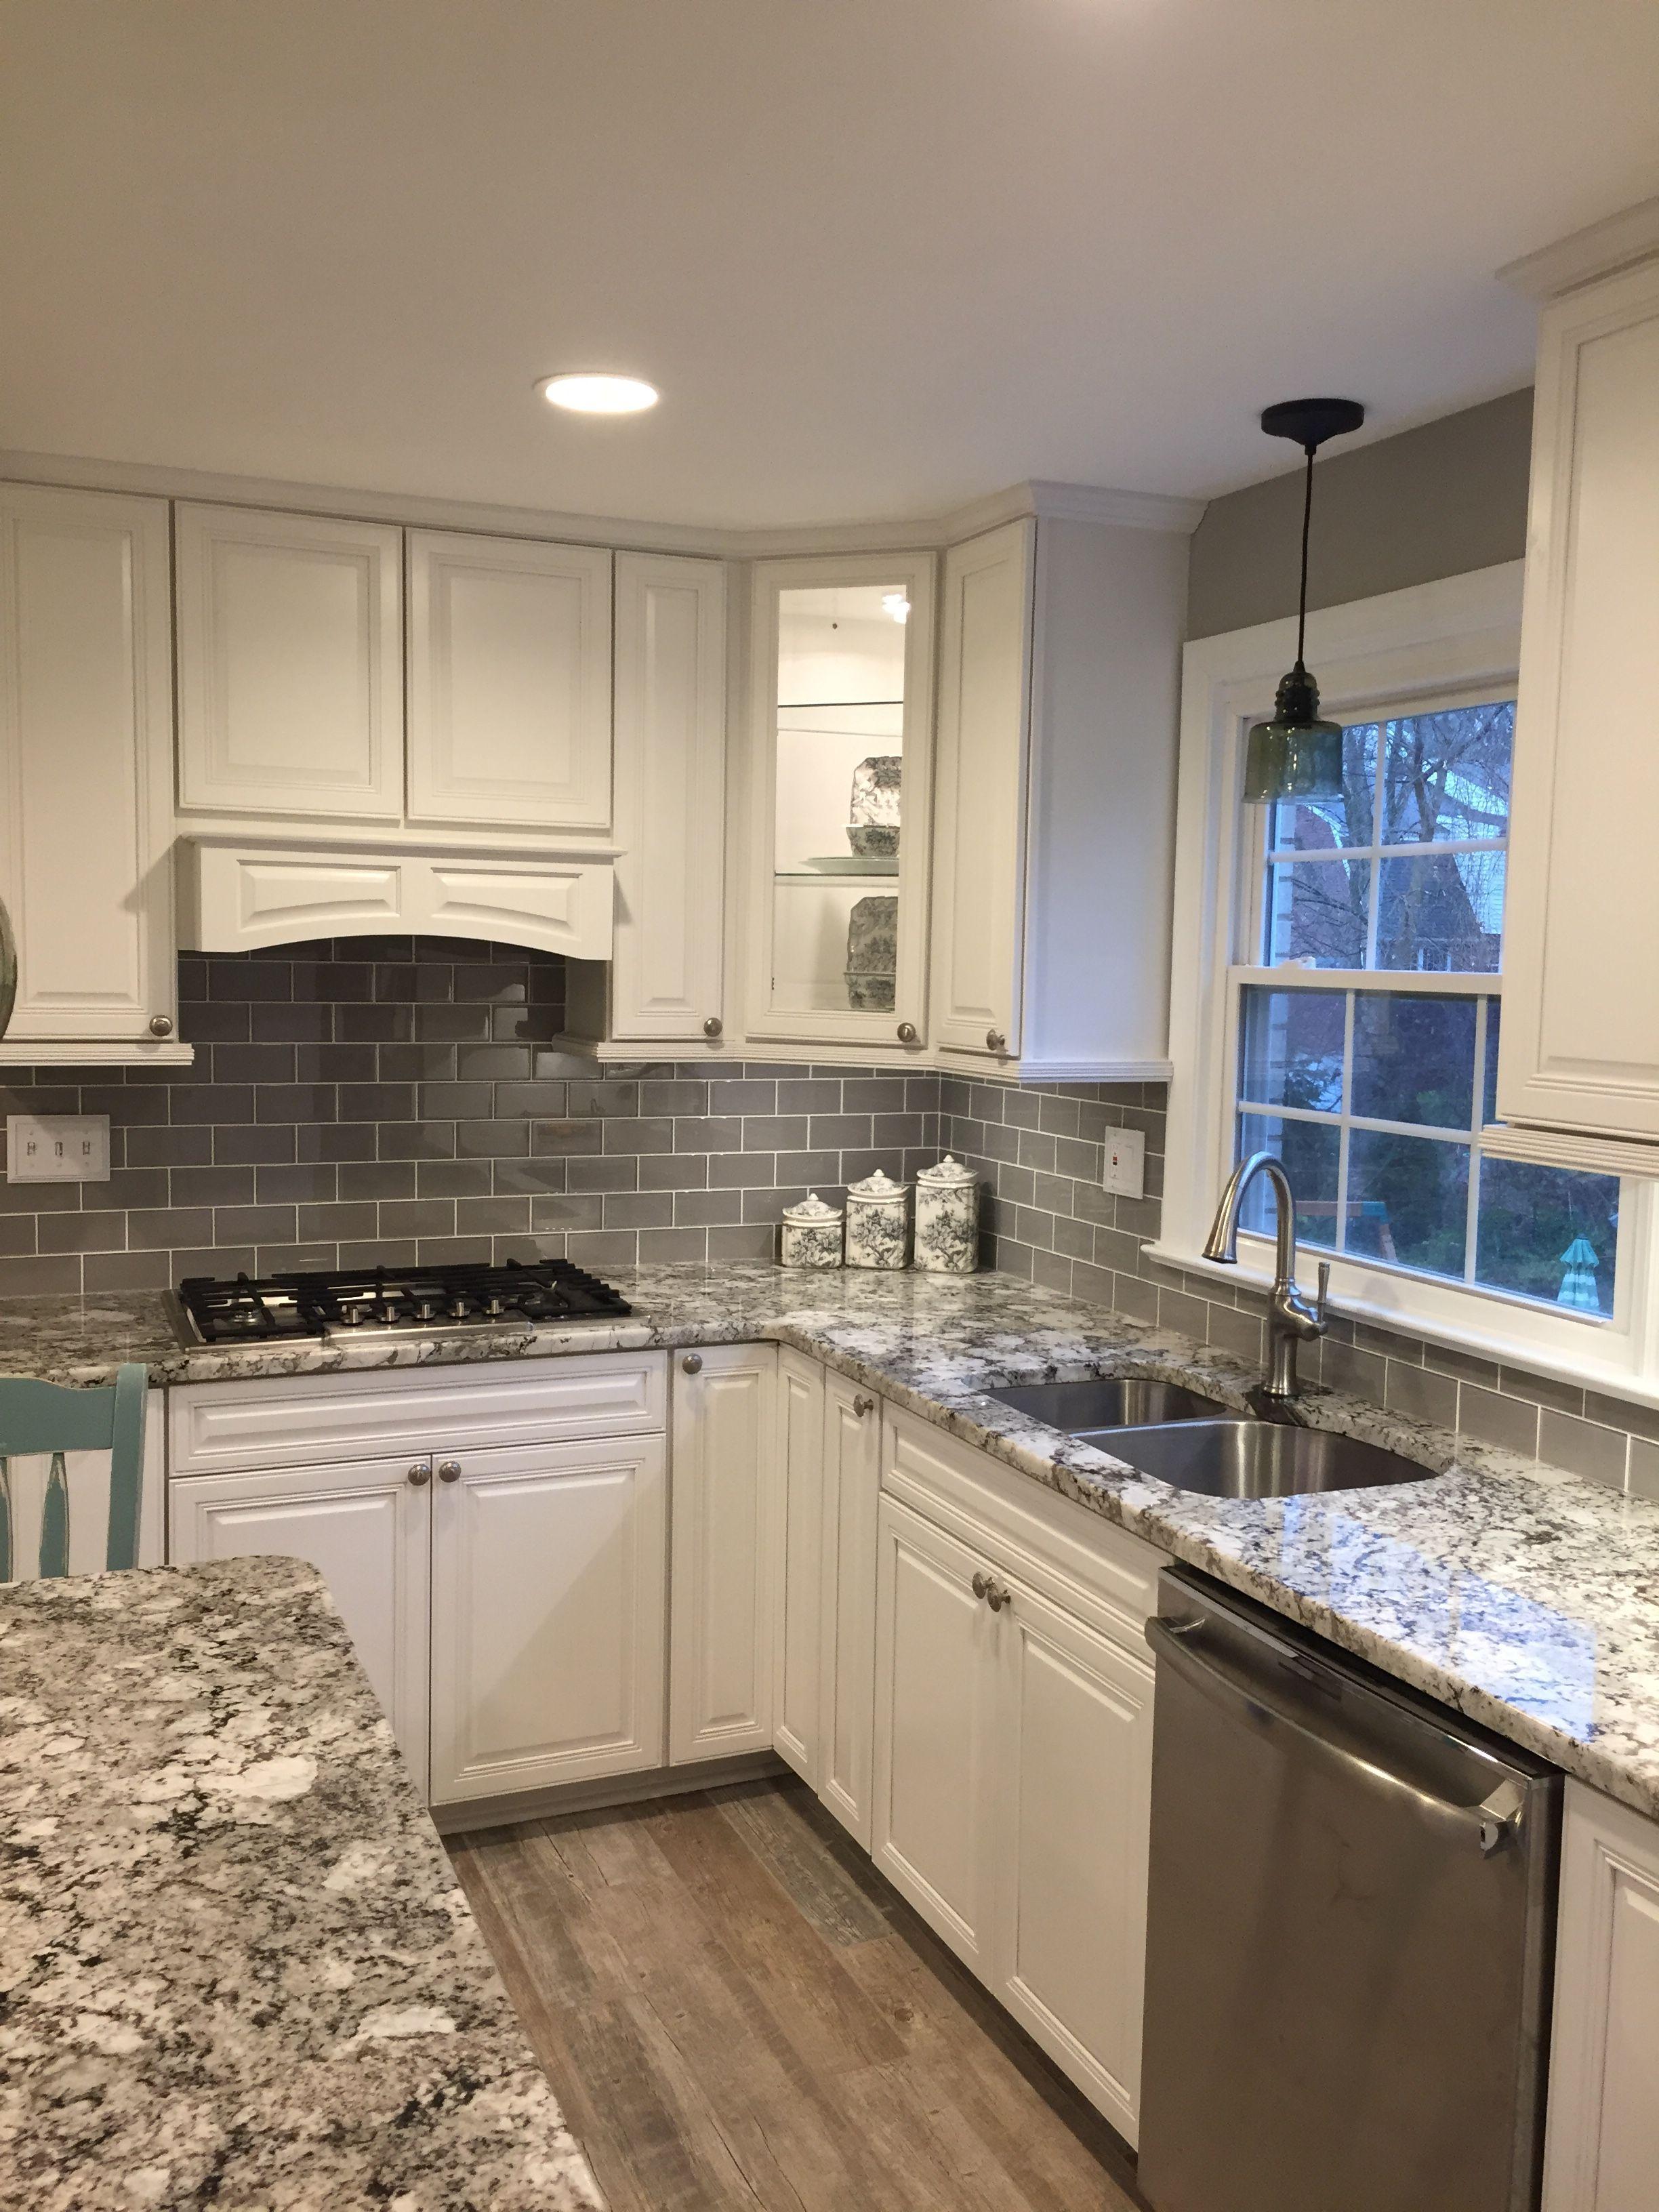 20+ best subway tile backsplash ideas for any kitchens | great